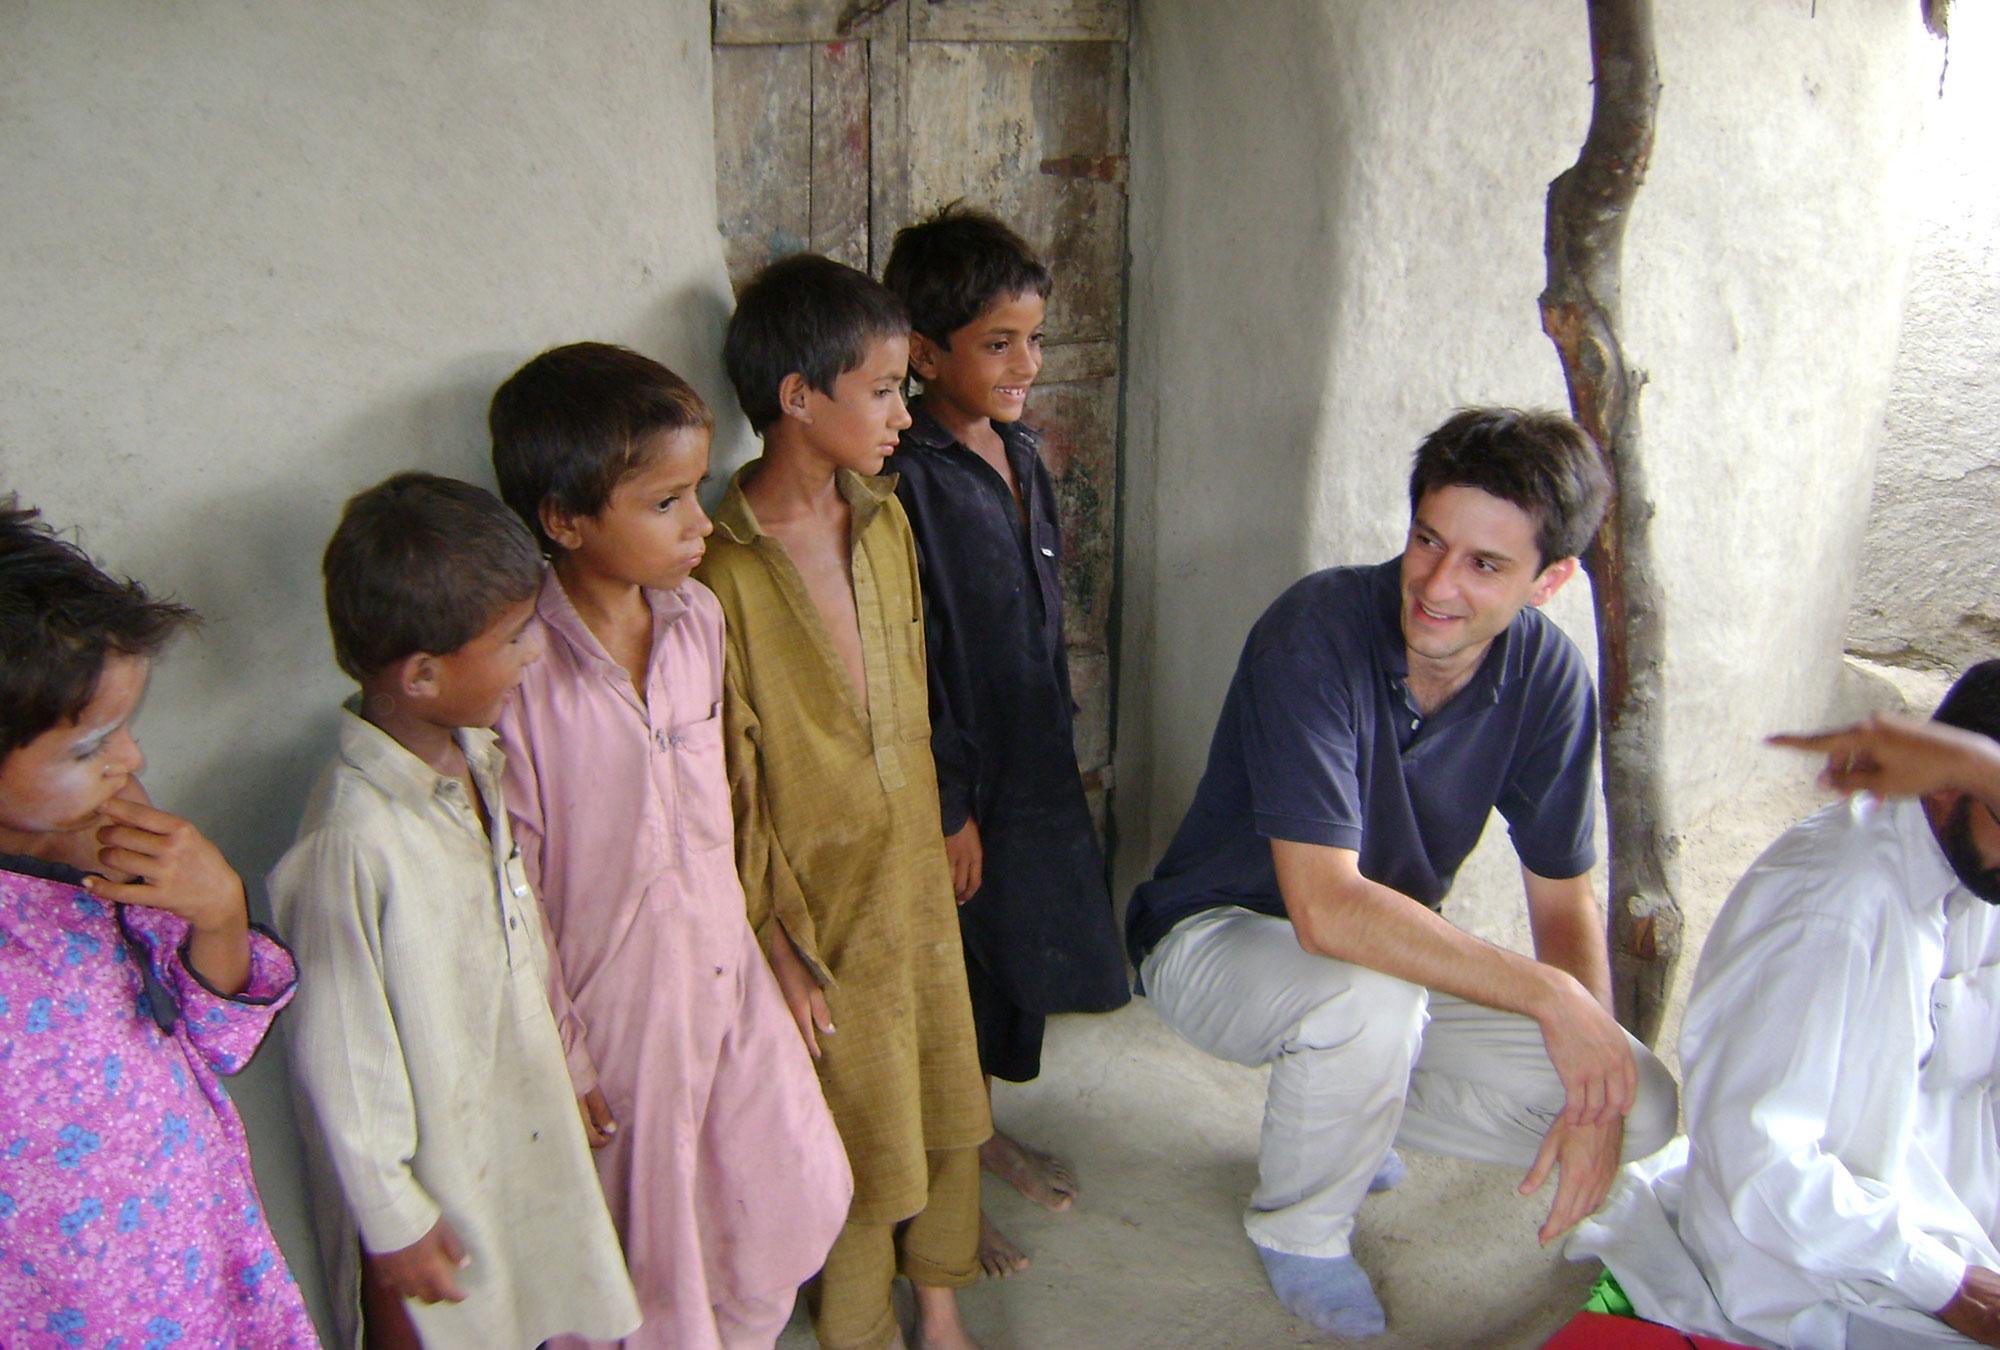 Children in shalwar kameez stand outside of mud building